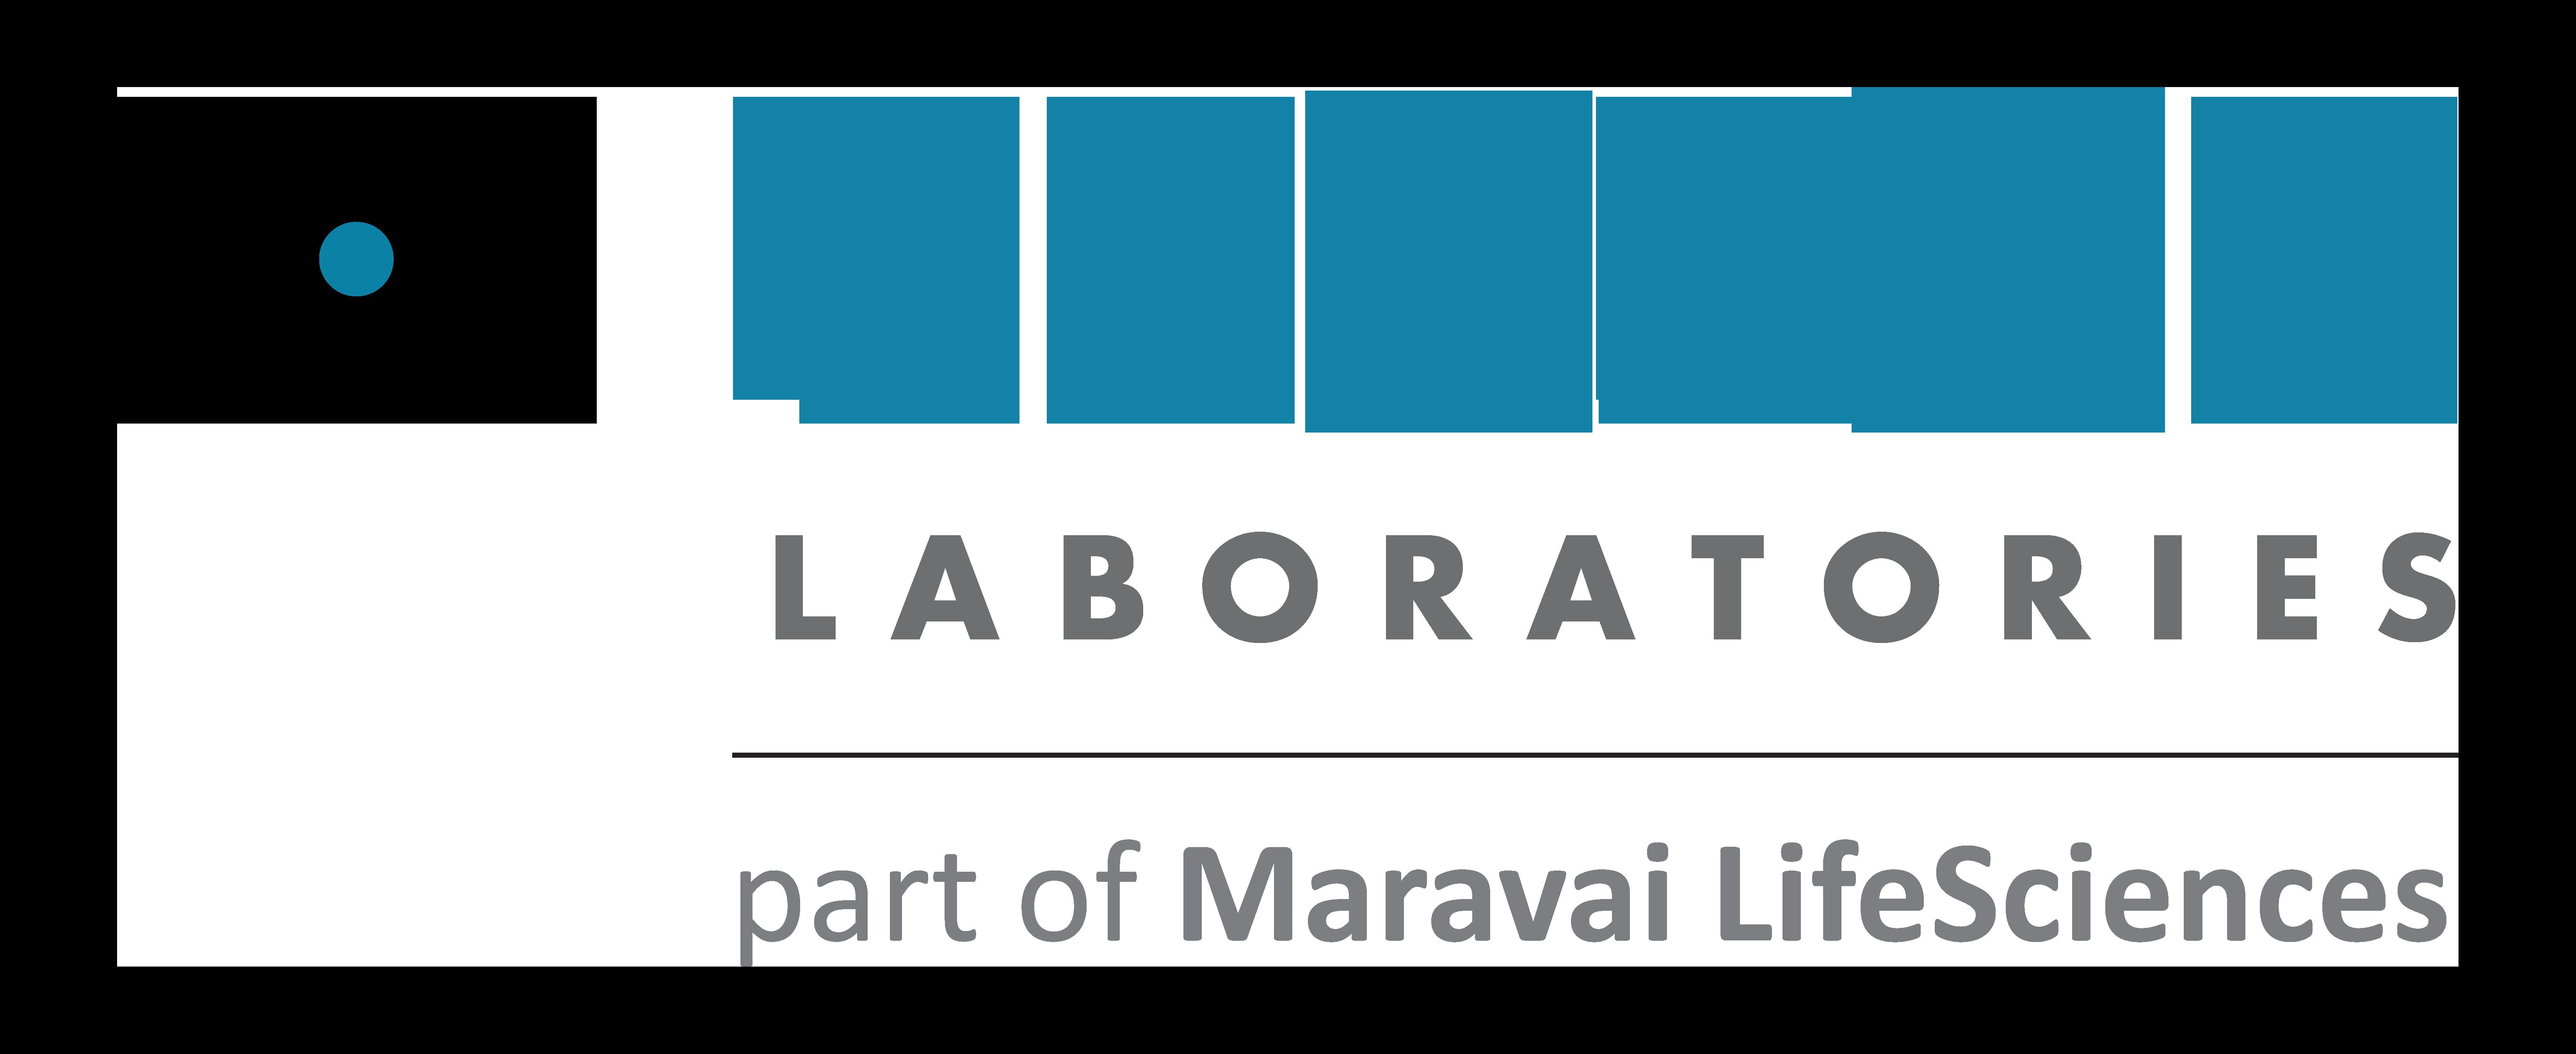 vector_laboratories_logo_transparent.png